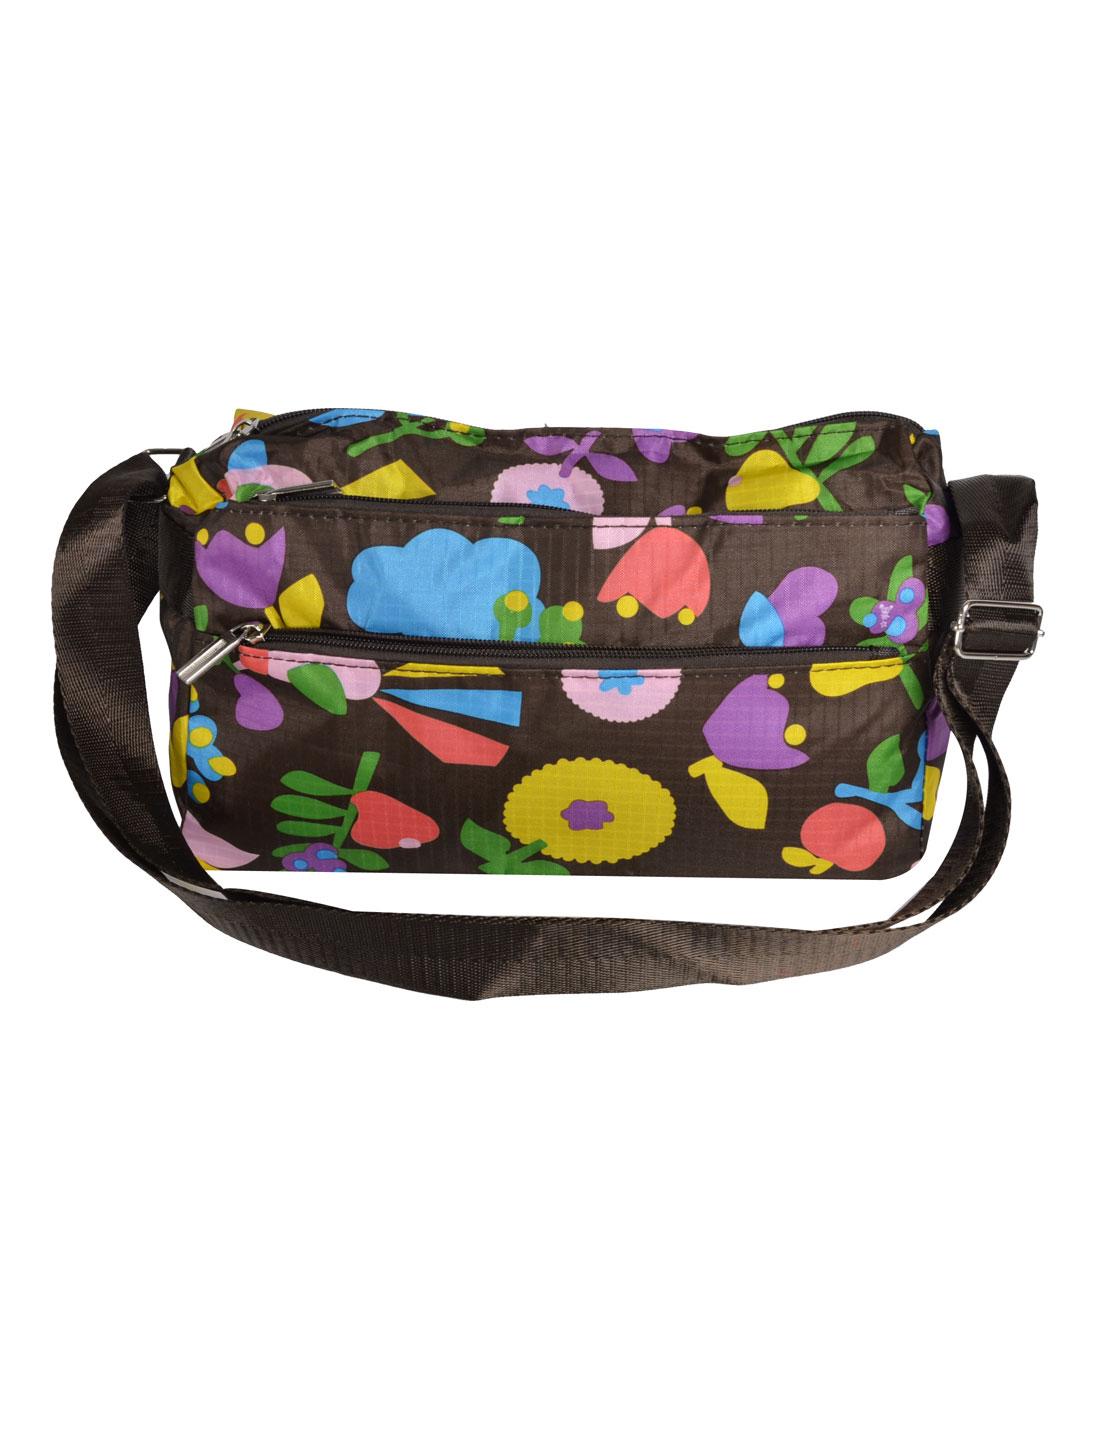 Lady Flower Pattern Rectangle Shaped Zipper Closure Nylon Shoulder Bag Handbag